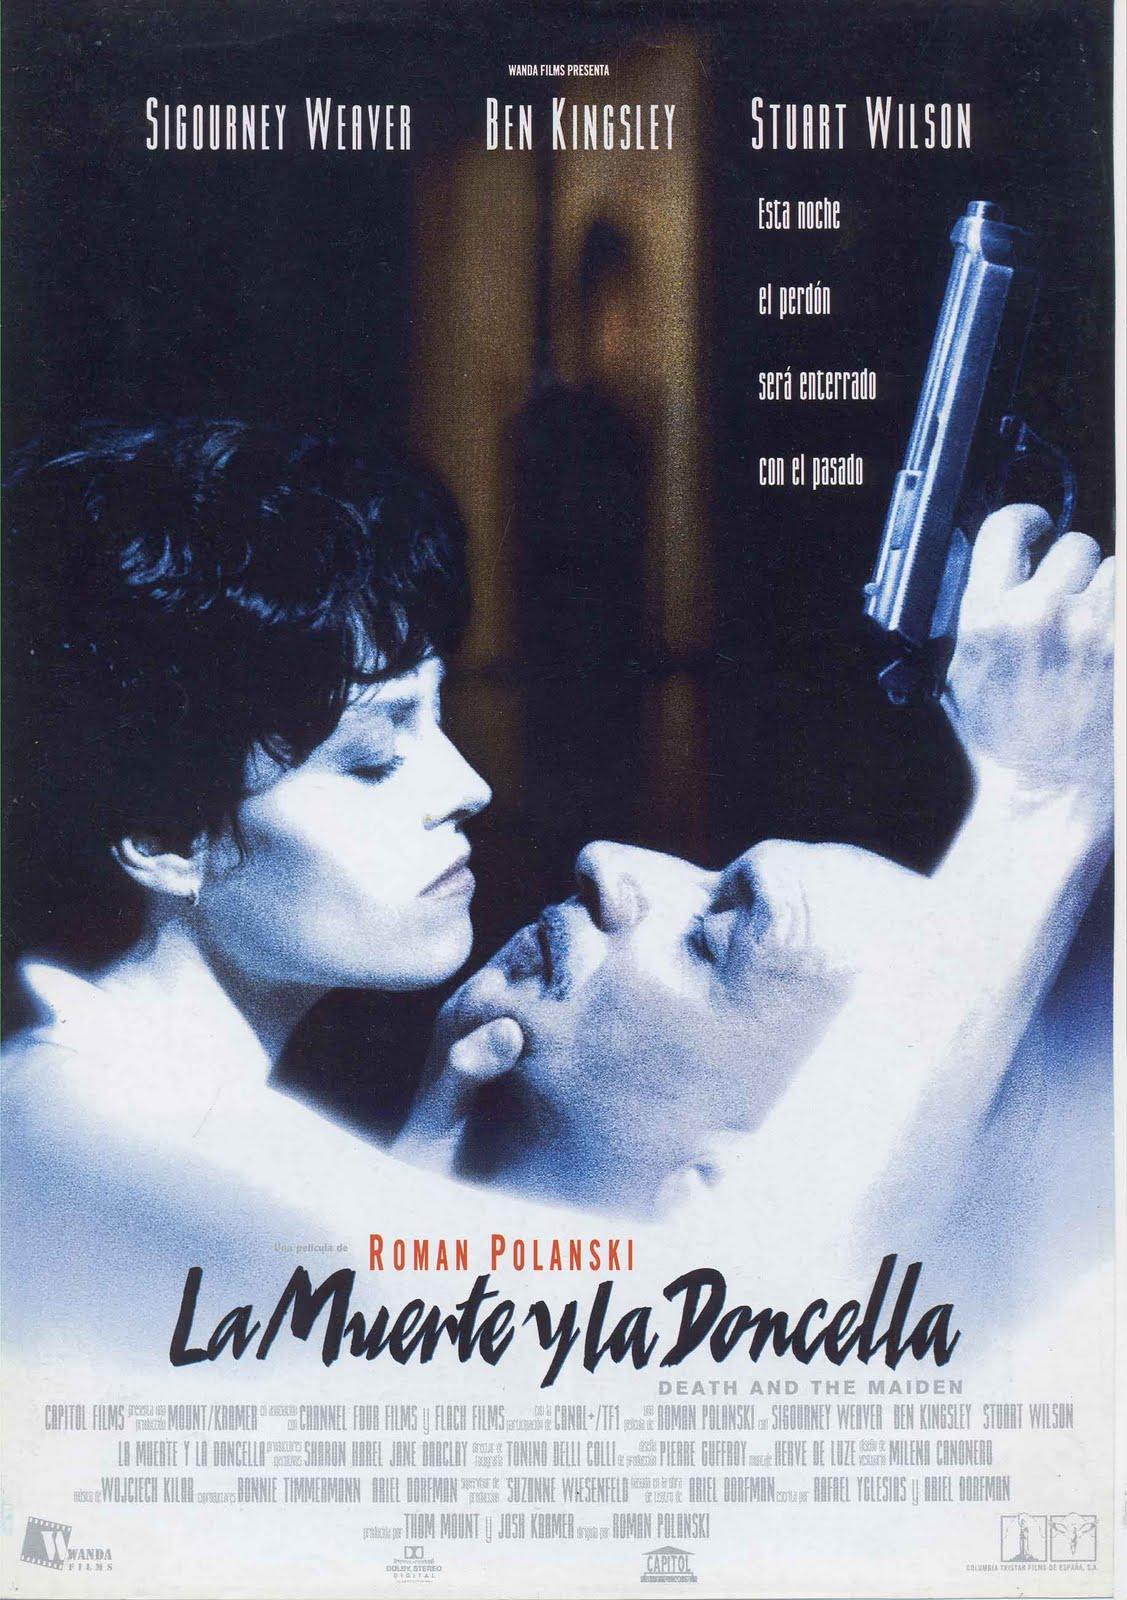 http://2.bp.blogspot.com/_TAXzPh6u6r0/S_qygz26u-I/AAAAAAAACB4/DTDyEvLze6s/s1600/muerte_y_la_doncella_-_Death_and_the_maiden_-_TT0109579_-_1994_-_es.jpg